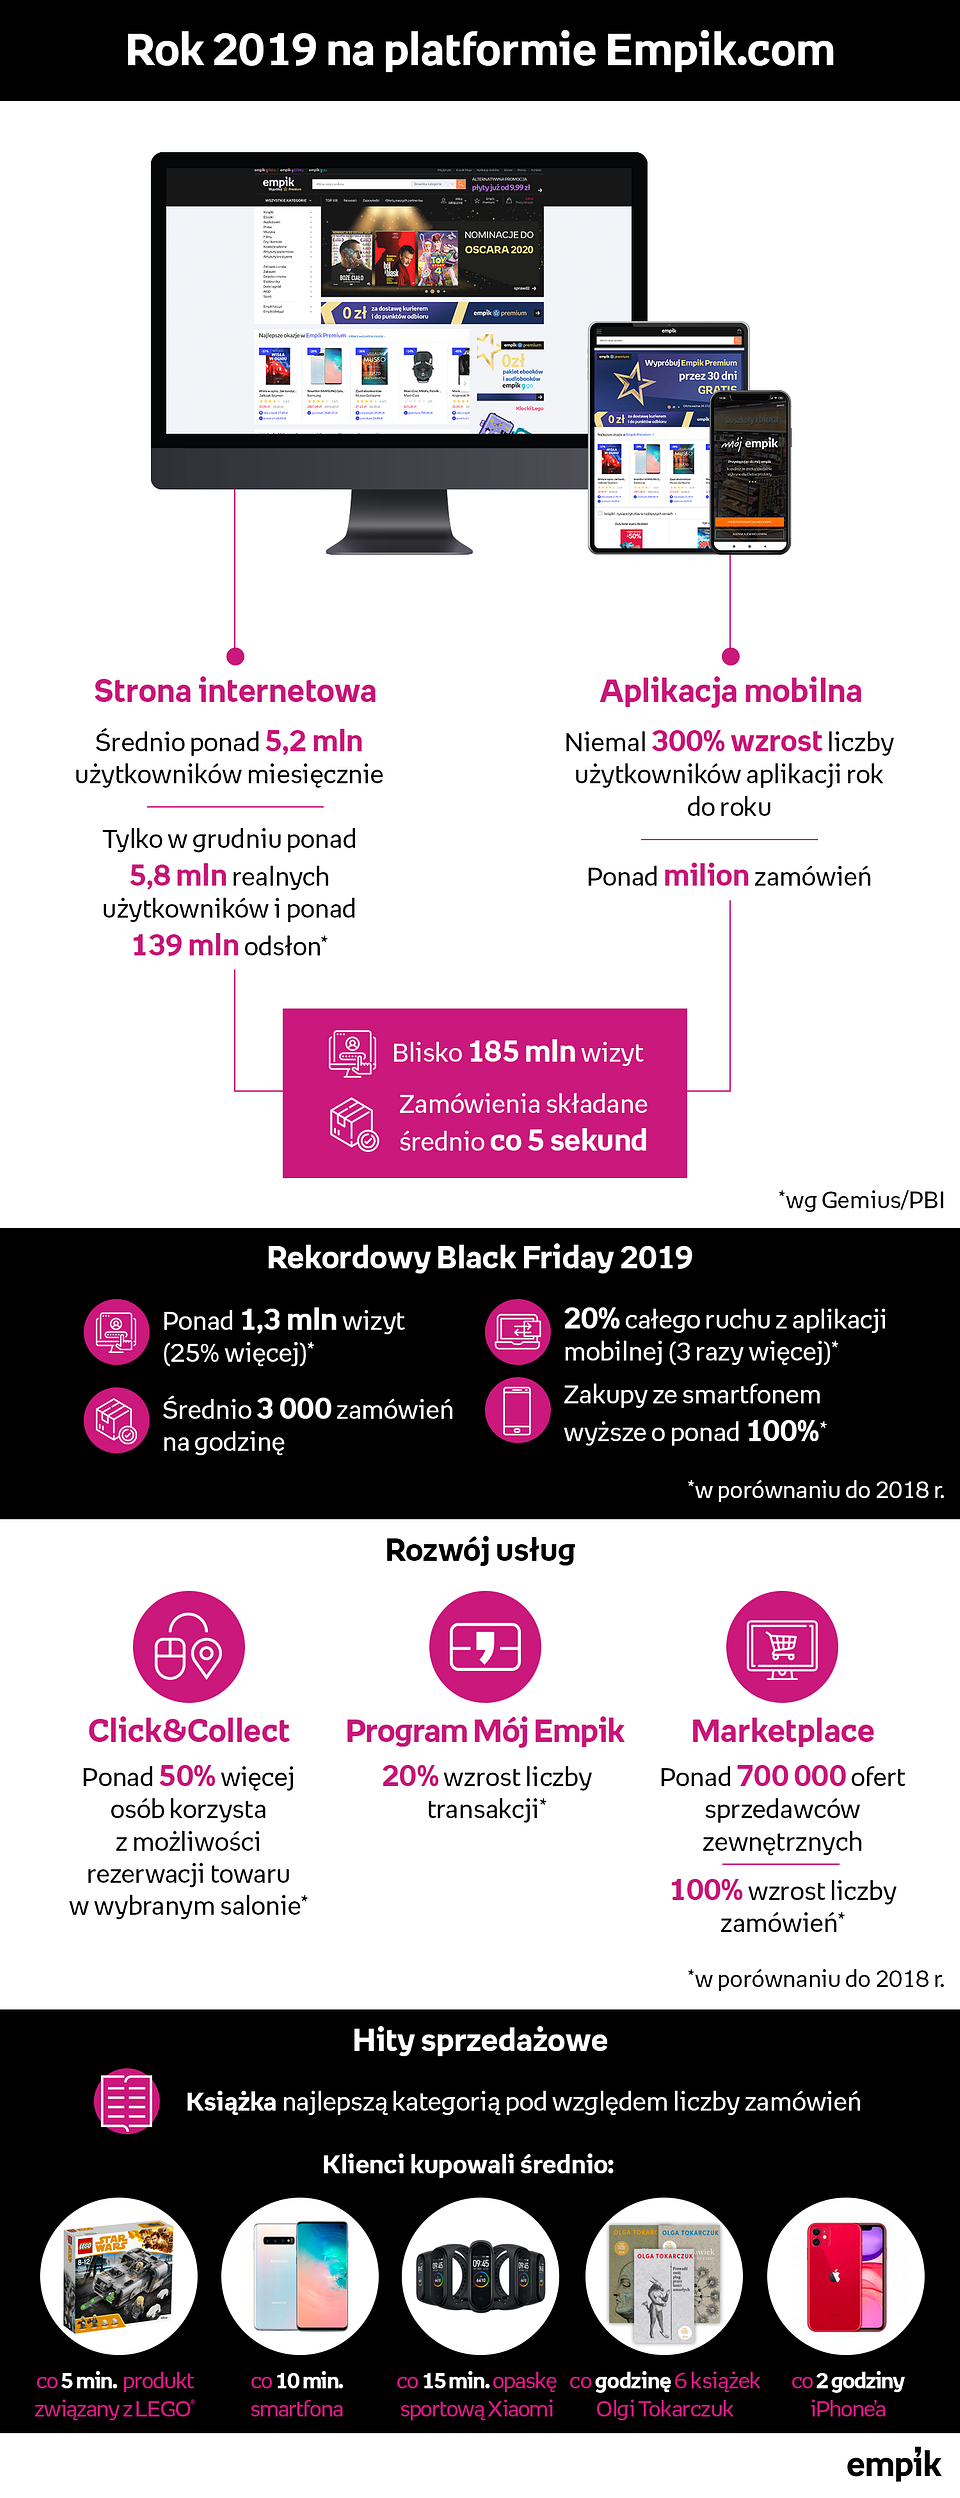 Podsumowanie roku na Empik.com - infografika-kopia.png